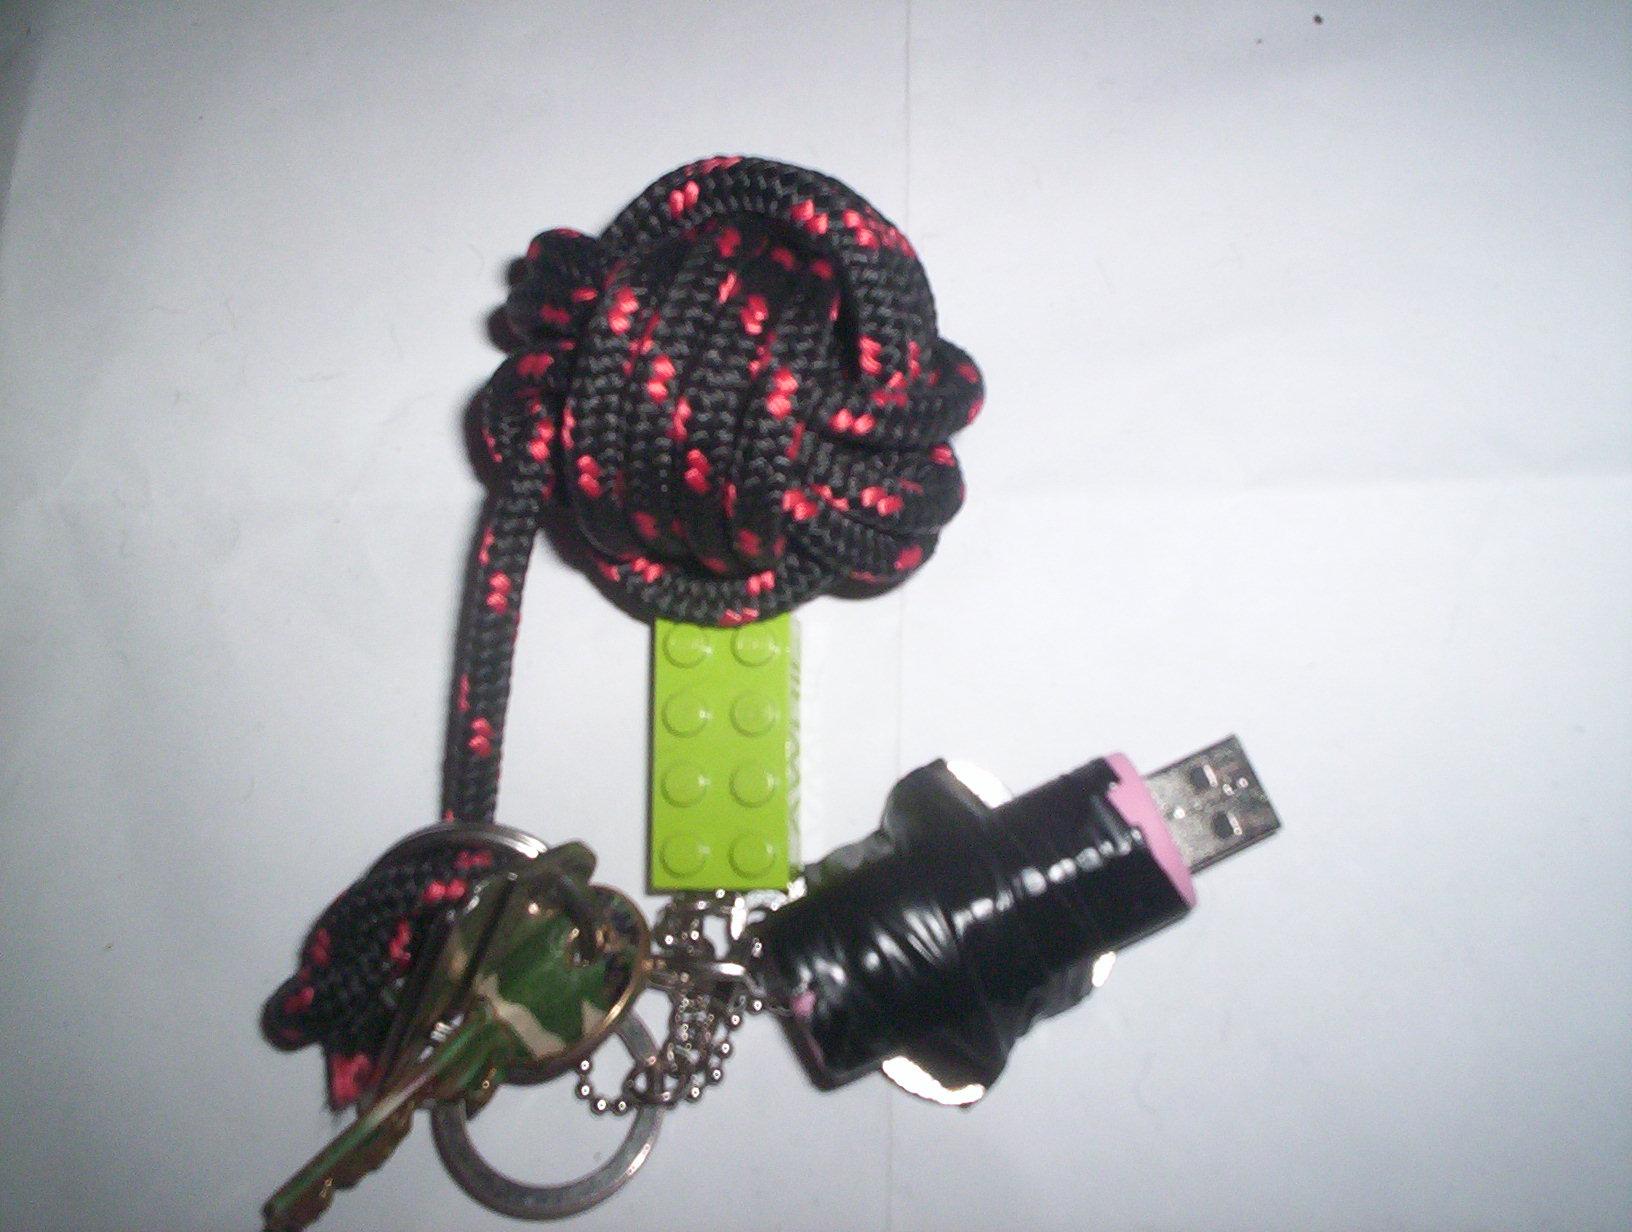 Monkey's Fist Floating Keychain